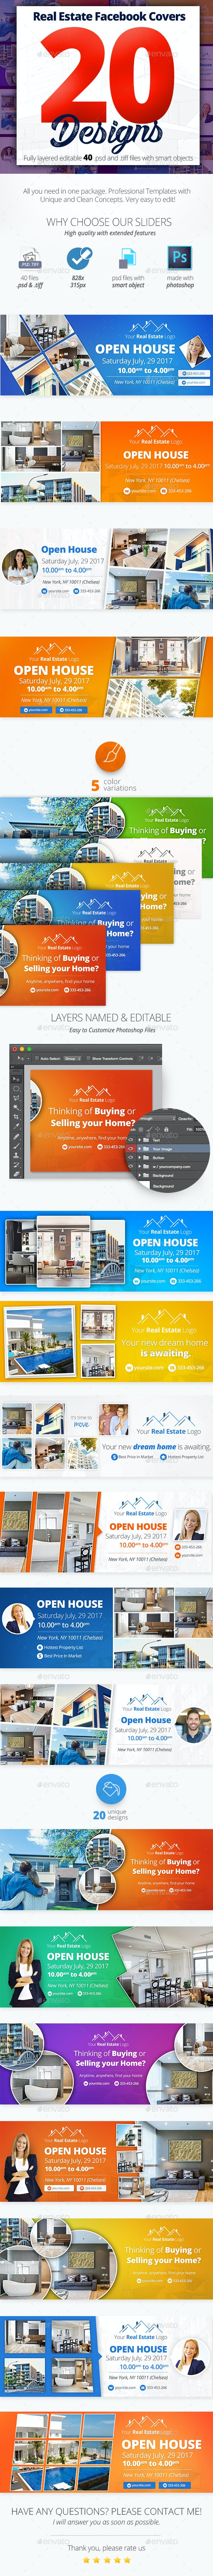 Real Estate Facebook Covers 20 Designs - Facebook Timeline Covers Social Media